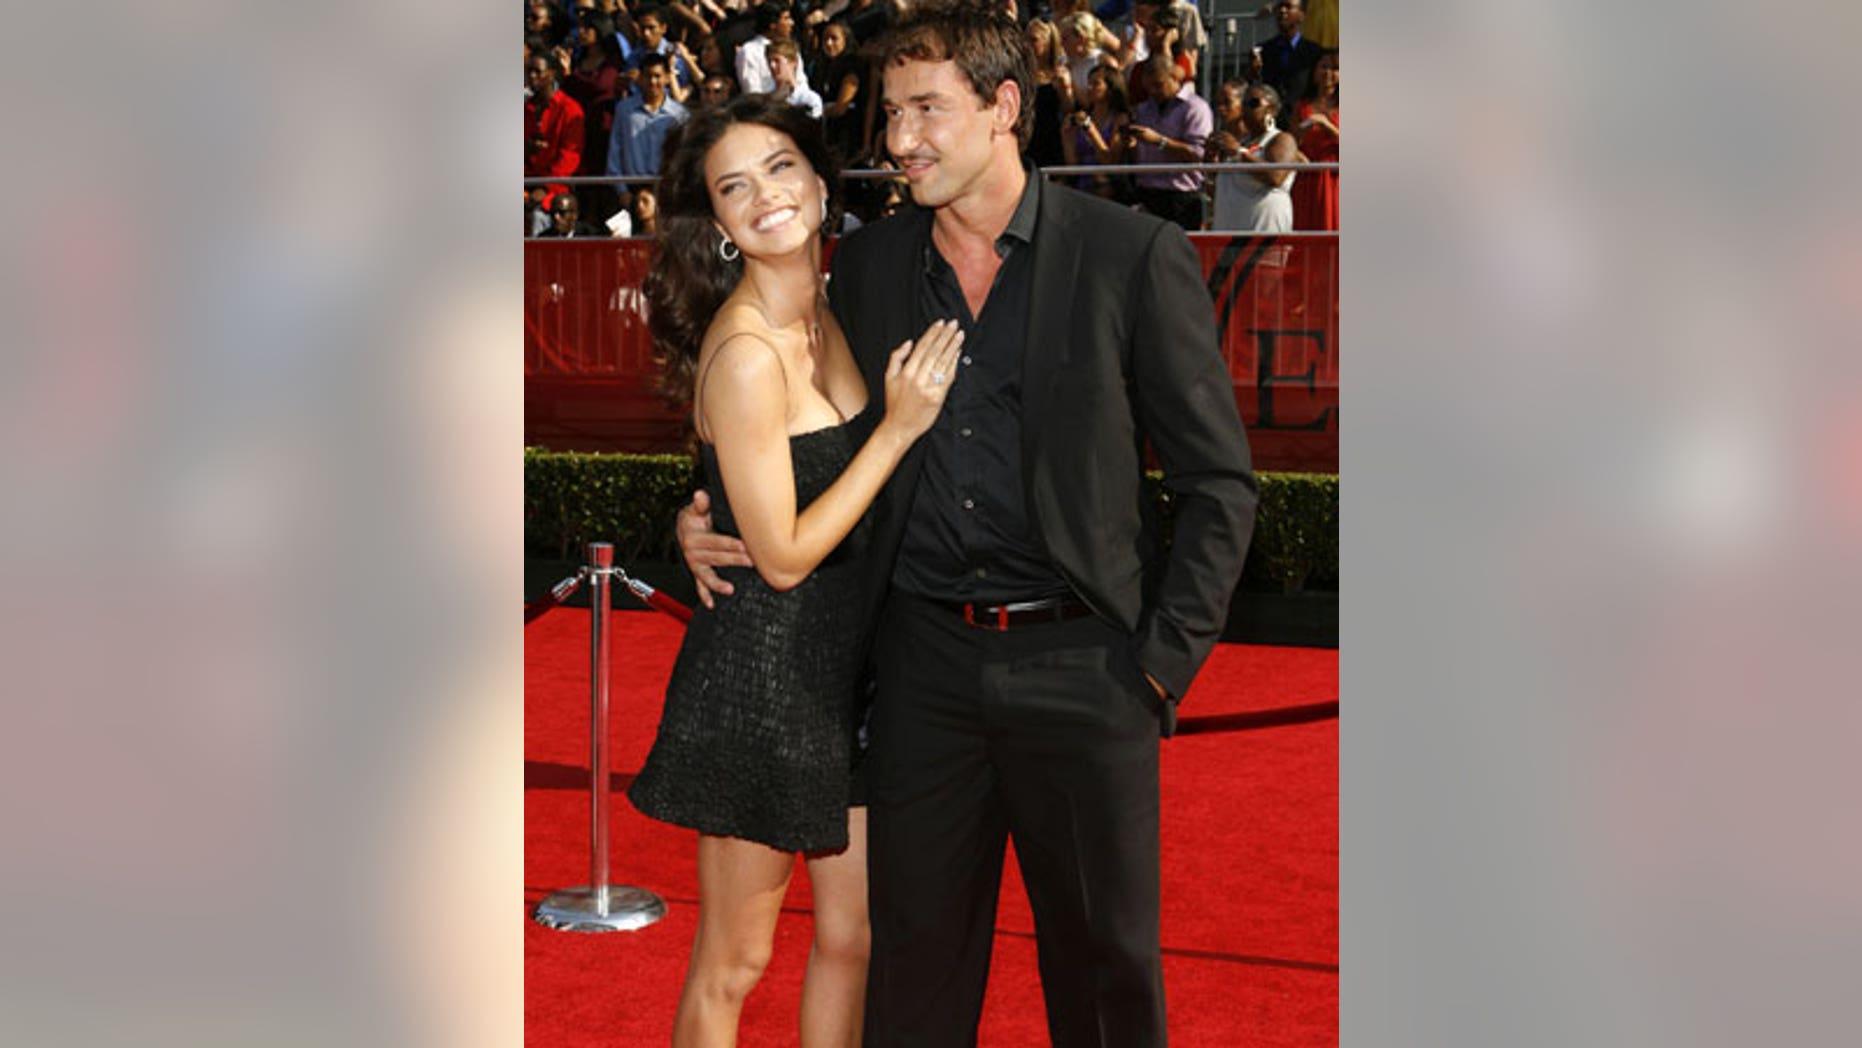 Adriana Lima with her new husband, Marko Jaric at the 2008 ESPY Awards.